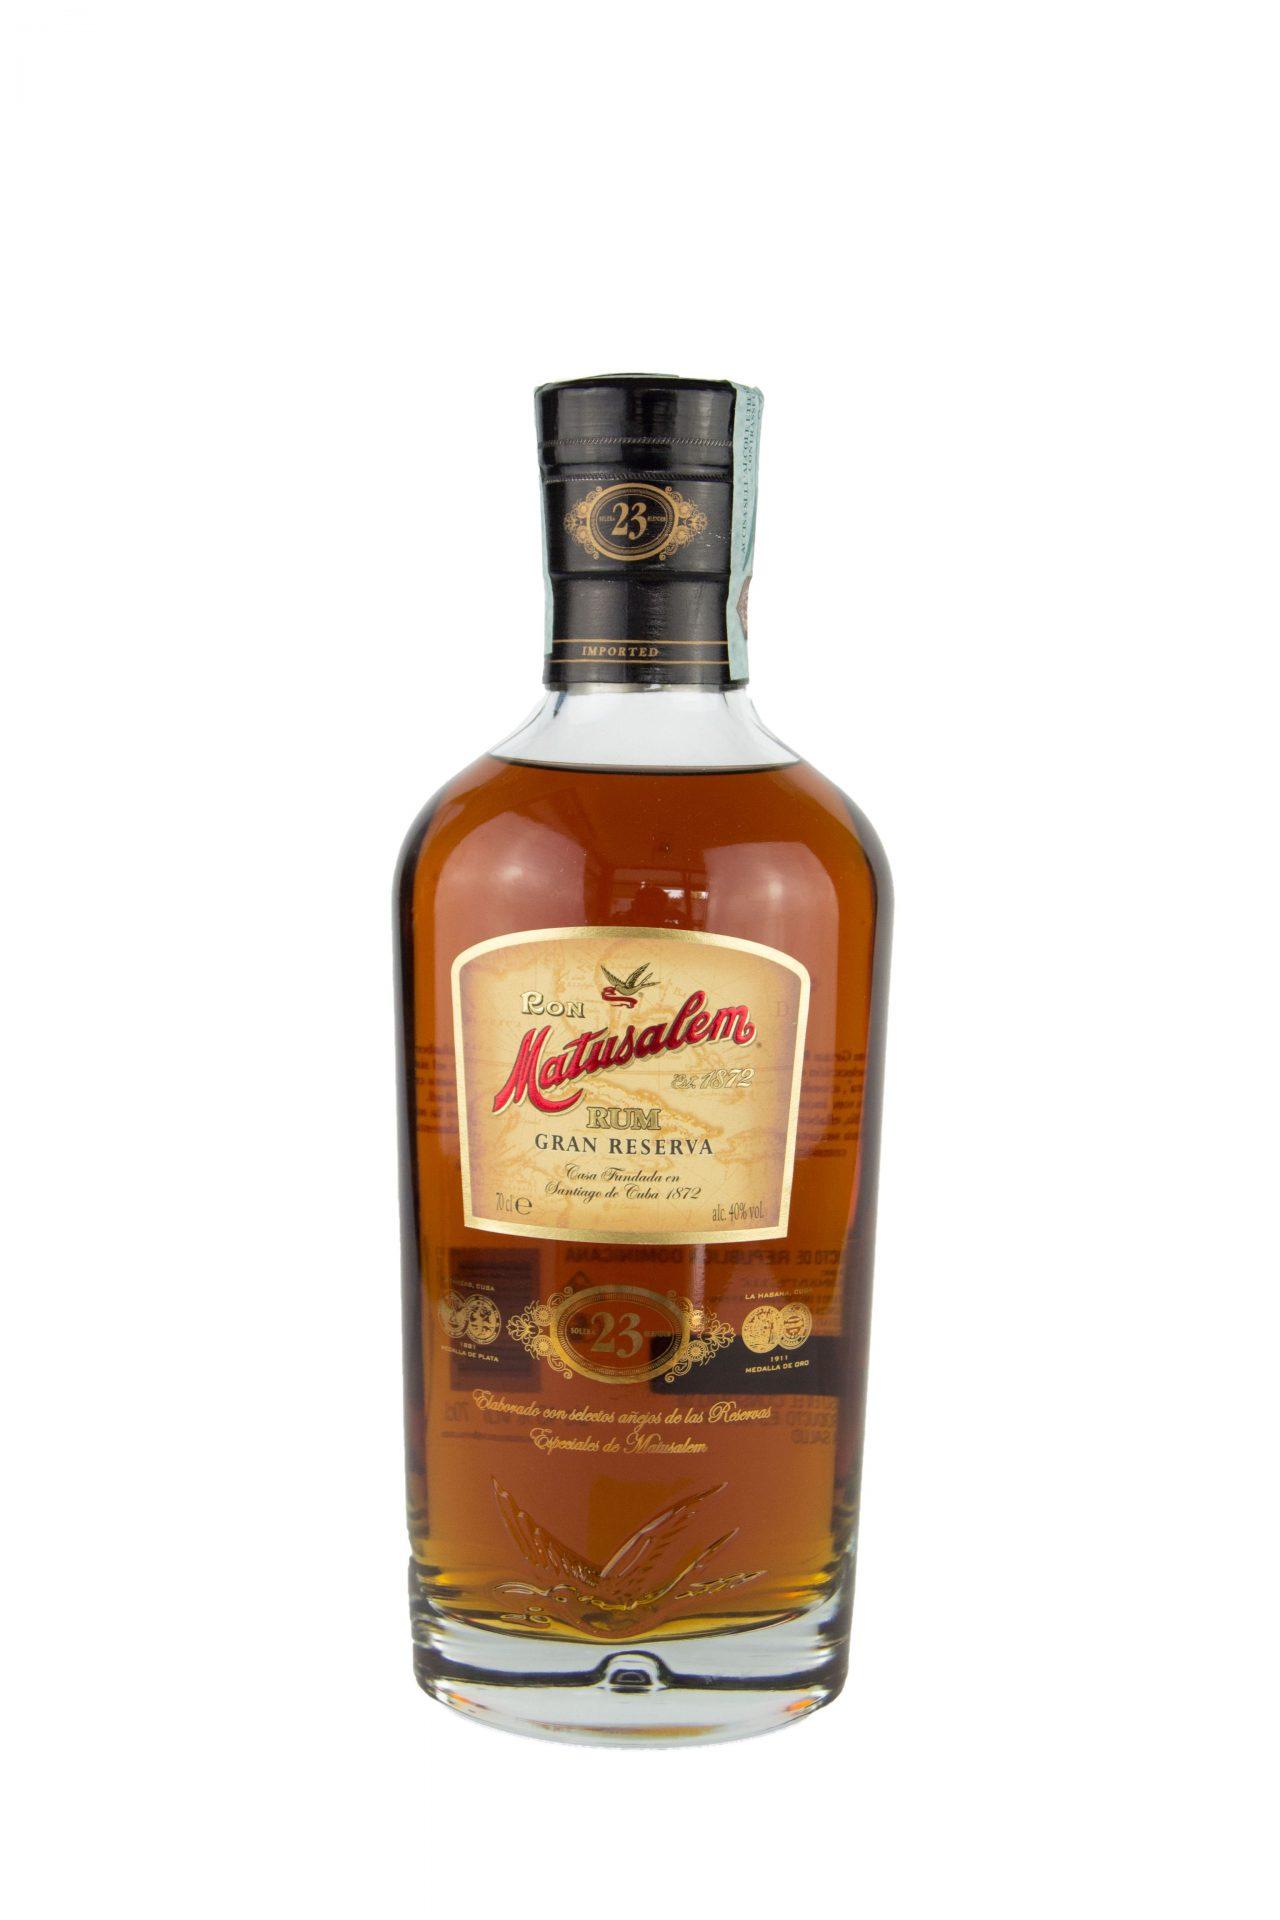 Ron Matusalem – Rum Gran Reserva